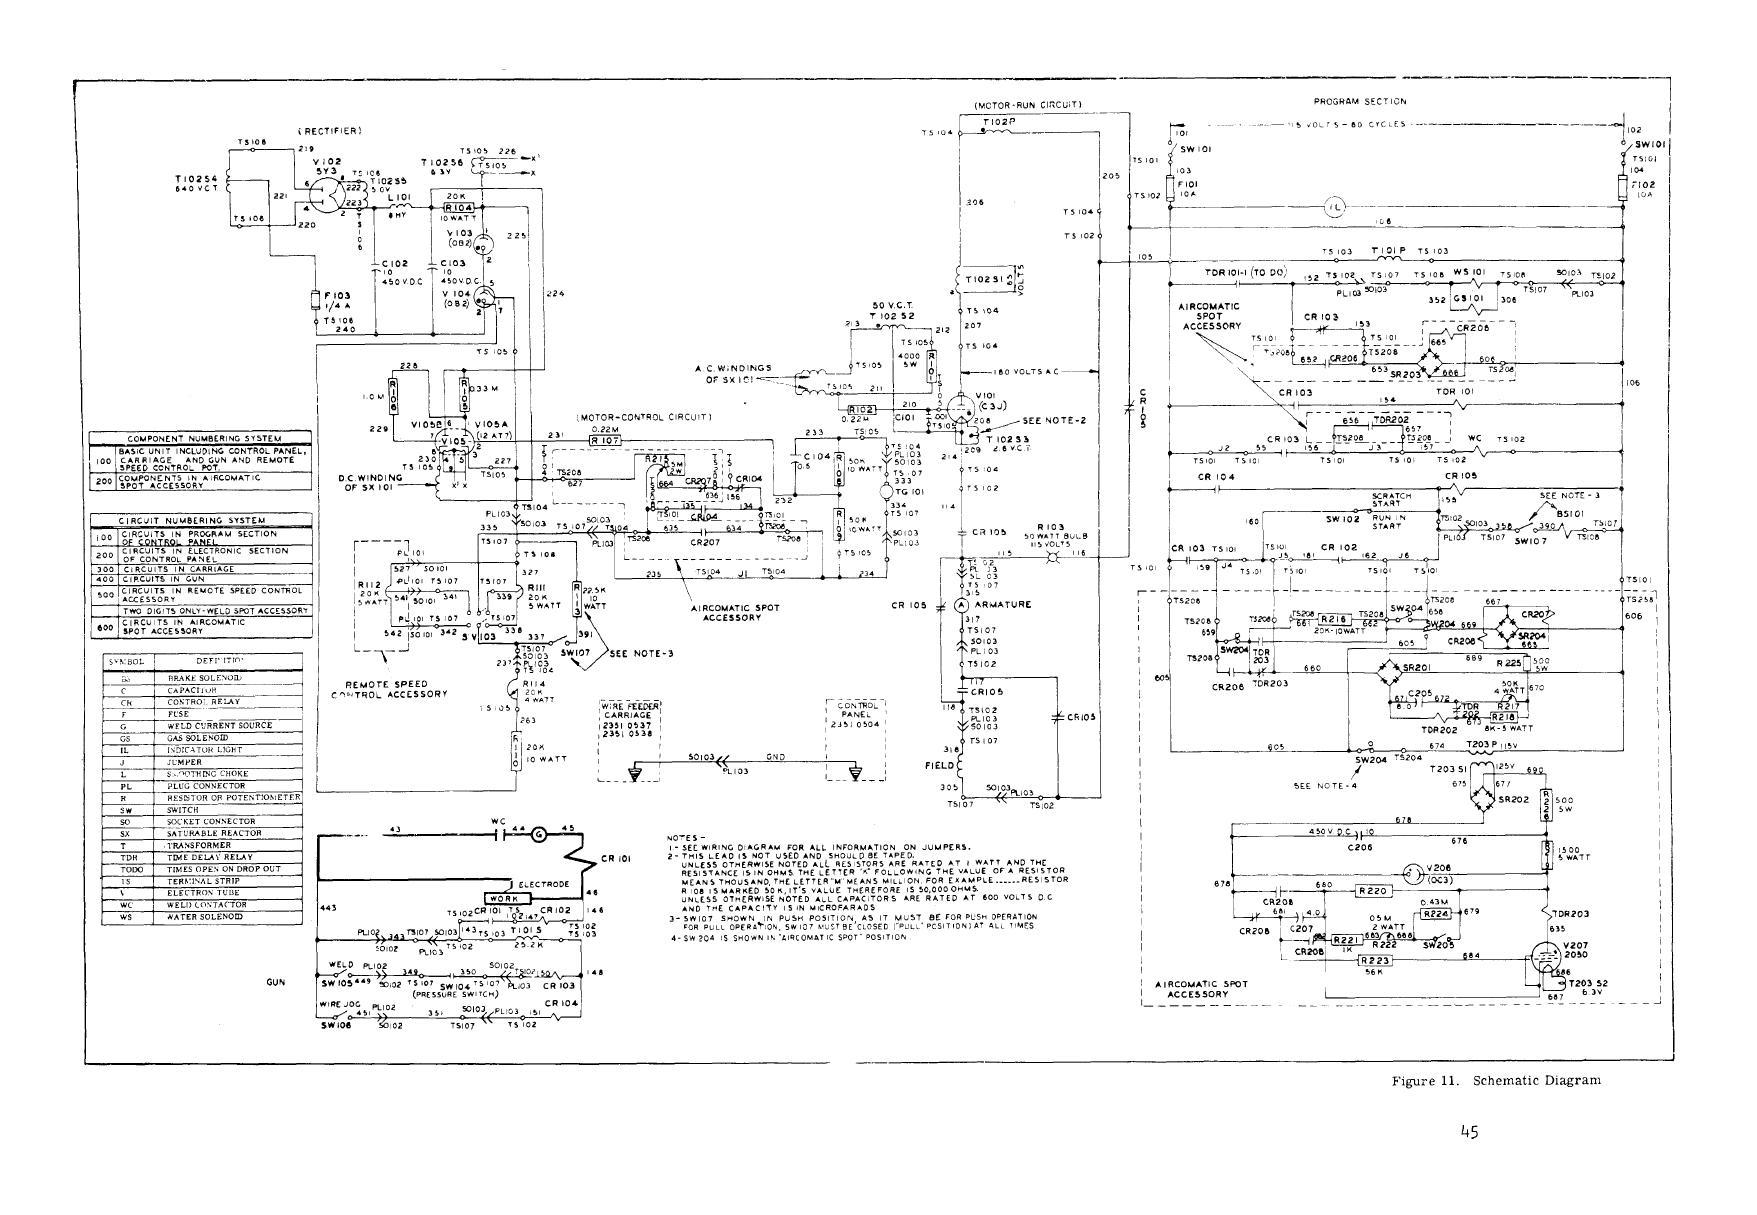 Figure 11 Schematic Diagram